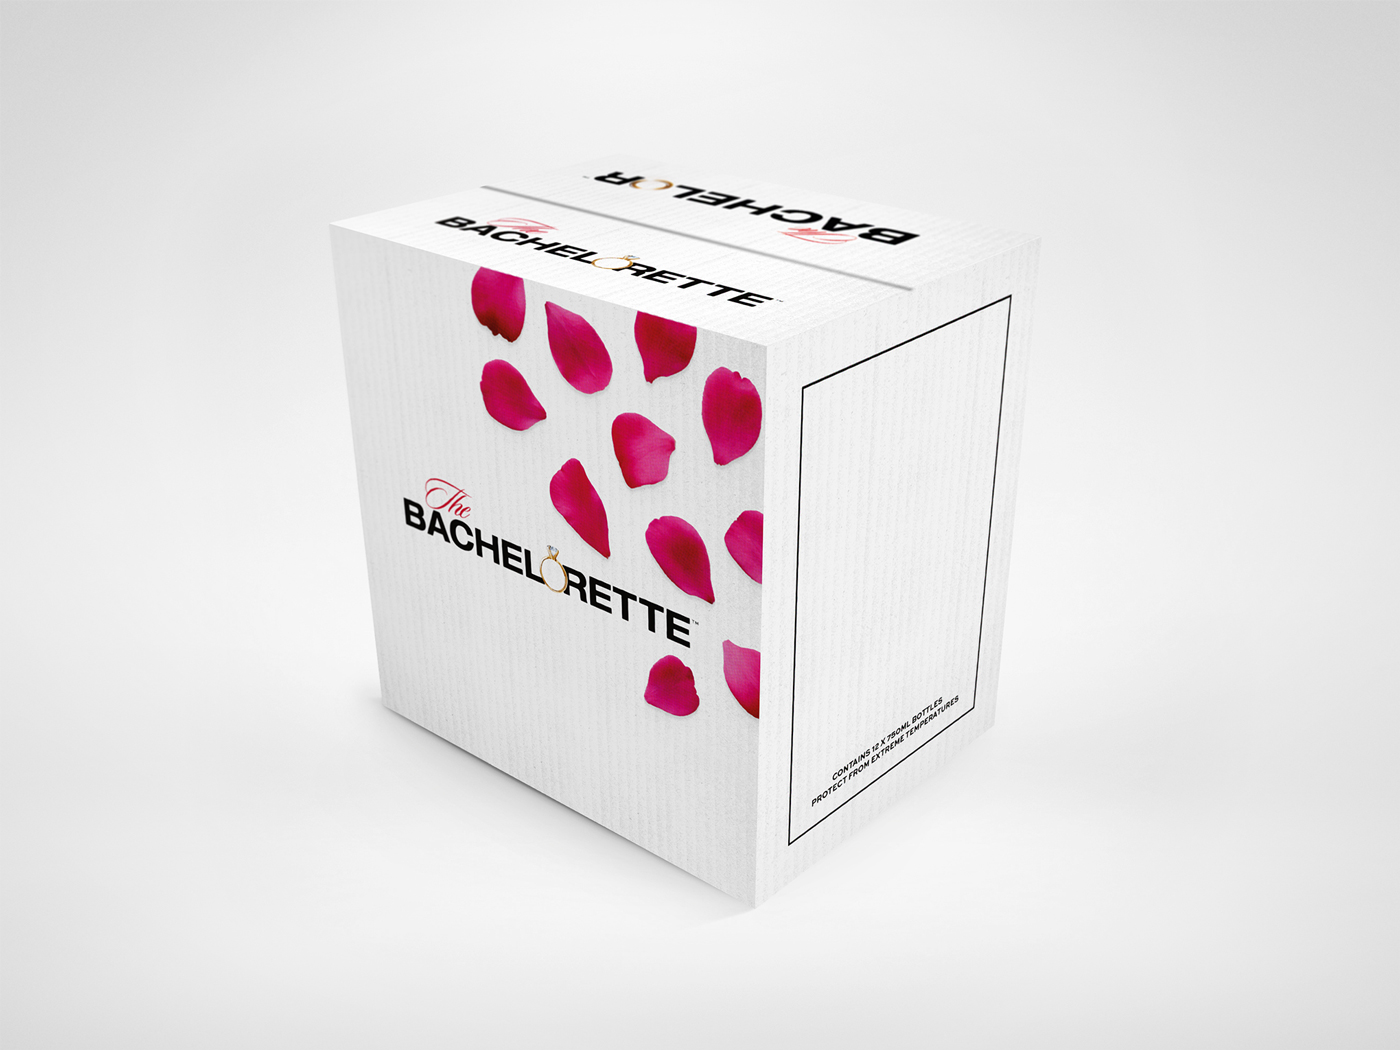 Bachelor Wines - Bachelorette Wine Shipper